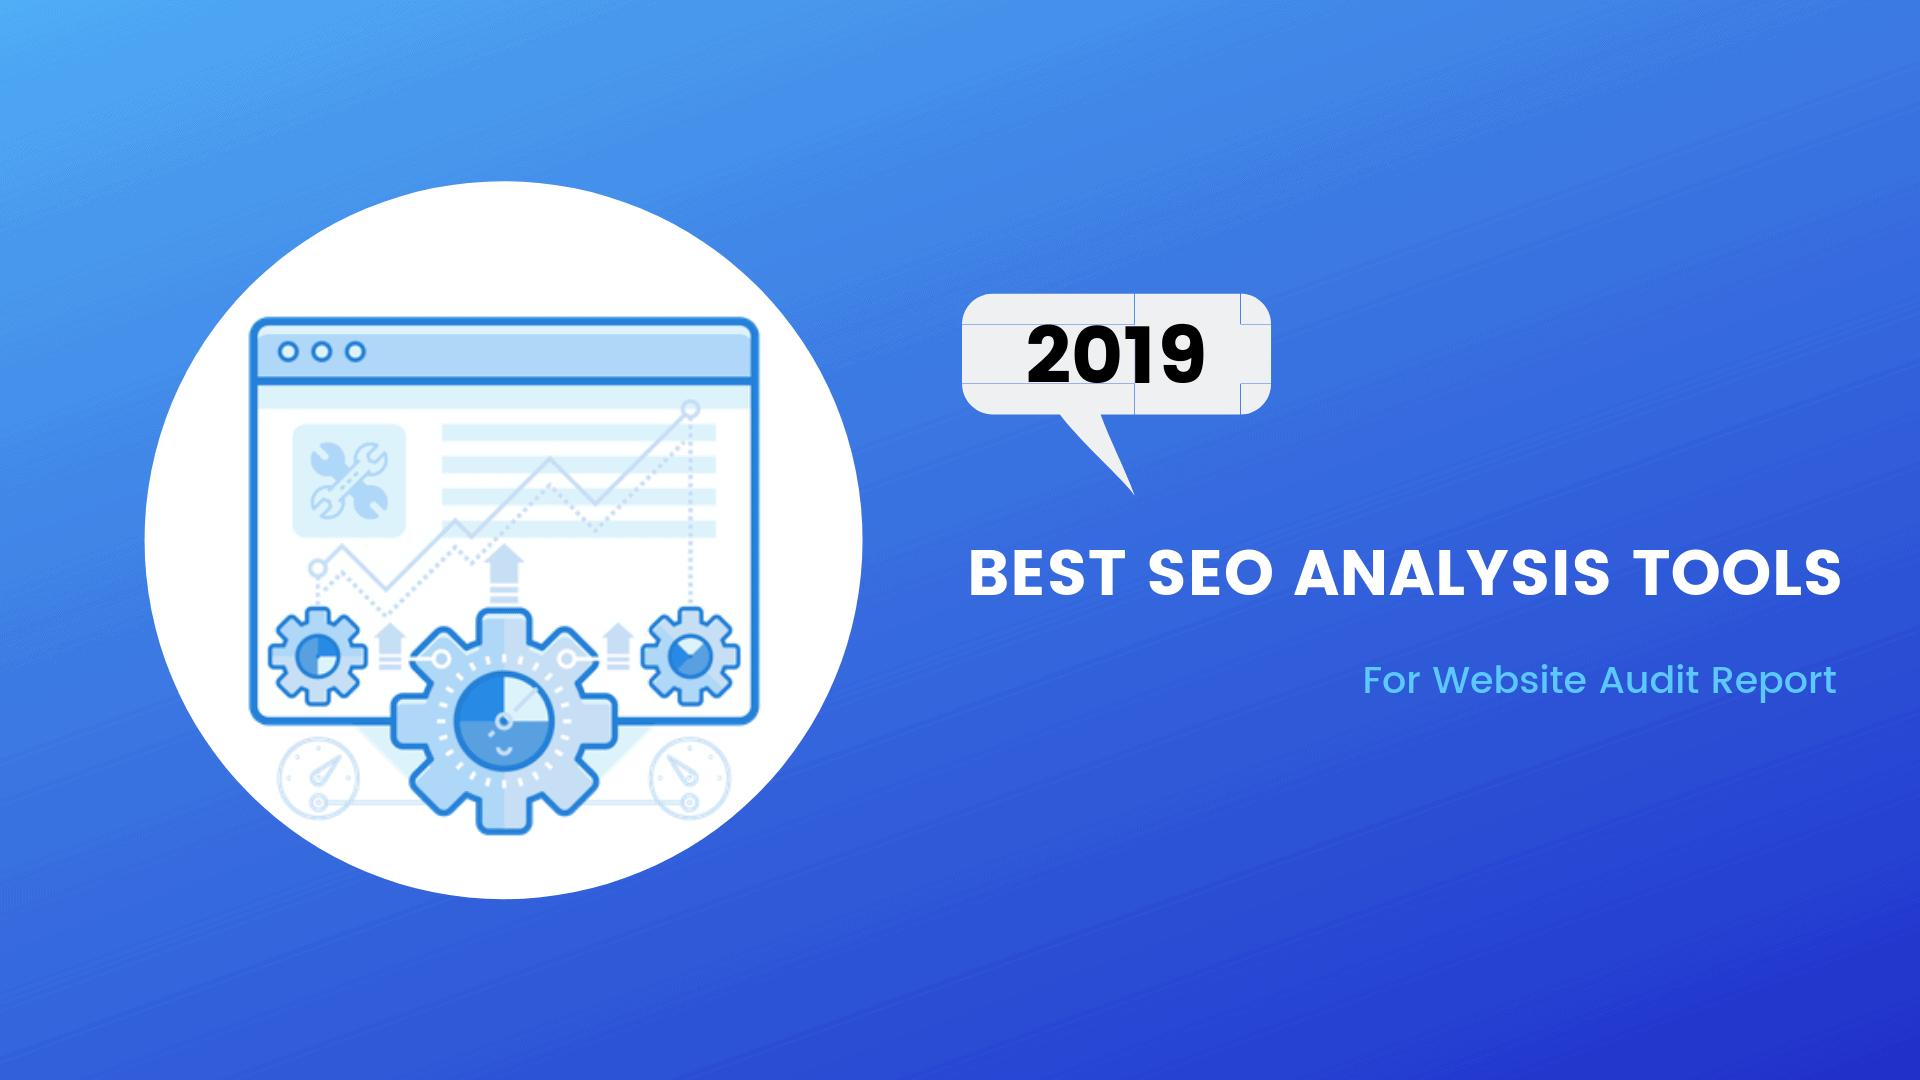 Best SEO Analysis Tools